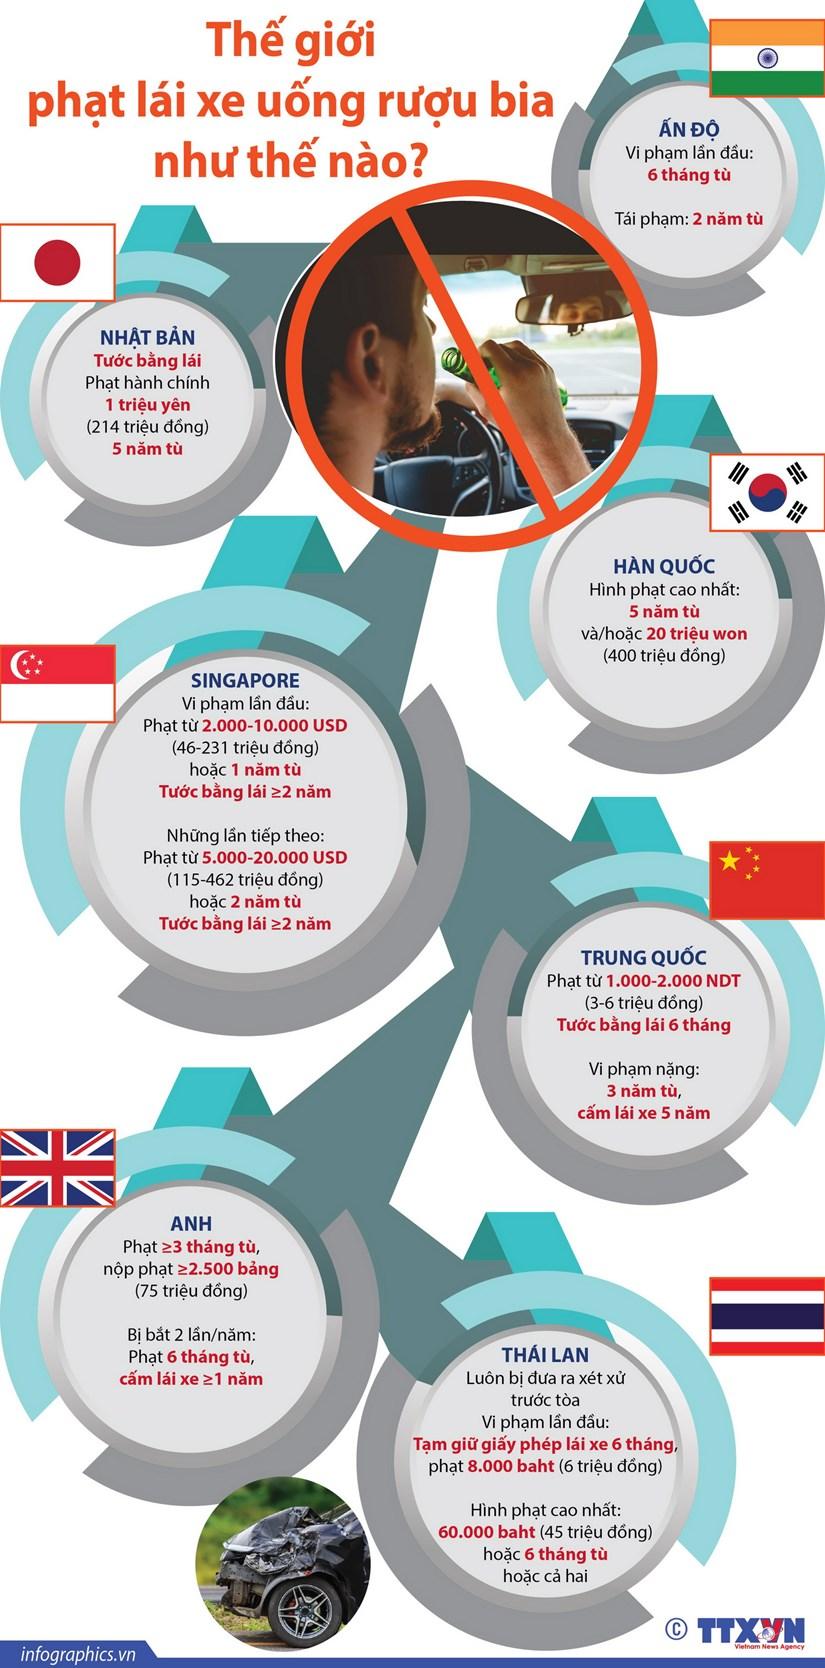 [Infographics] The gioi phat lai xe uong ruou bia nhu the nao? hinh anh 1